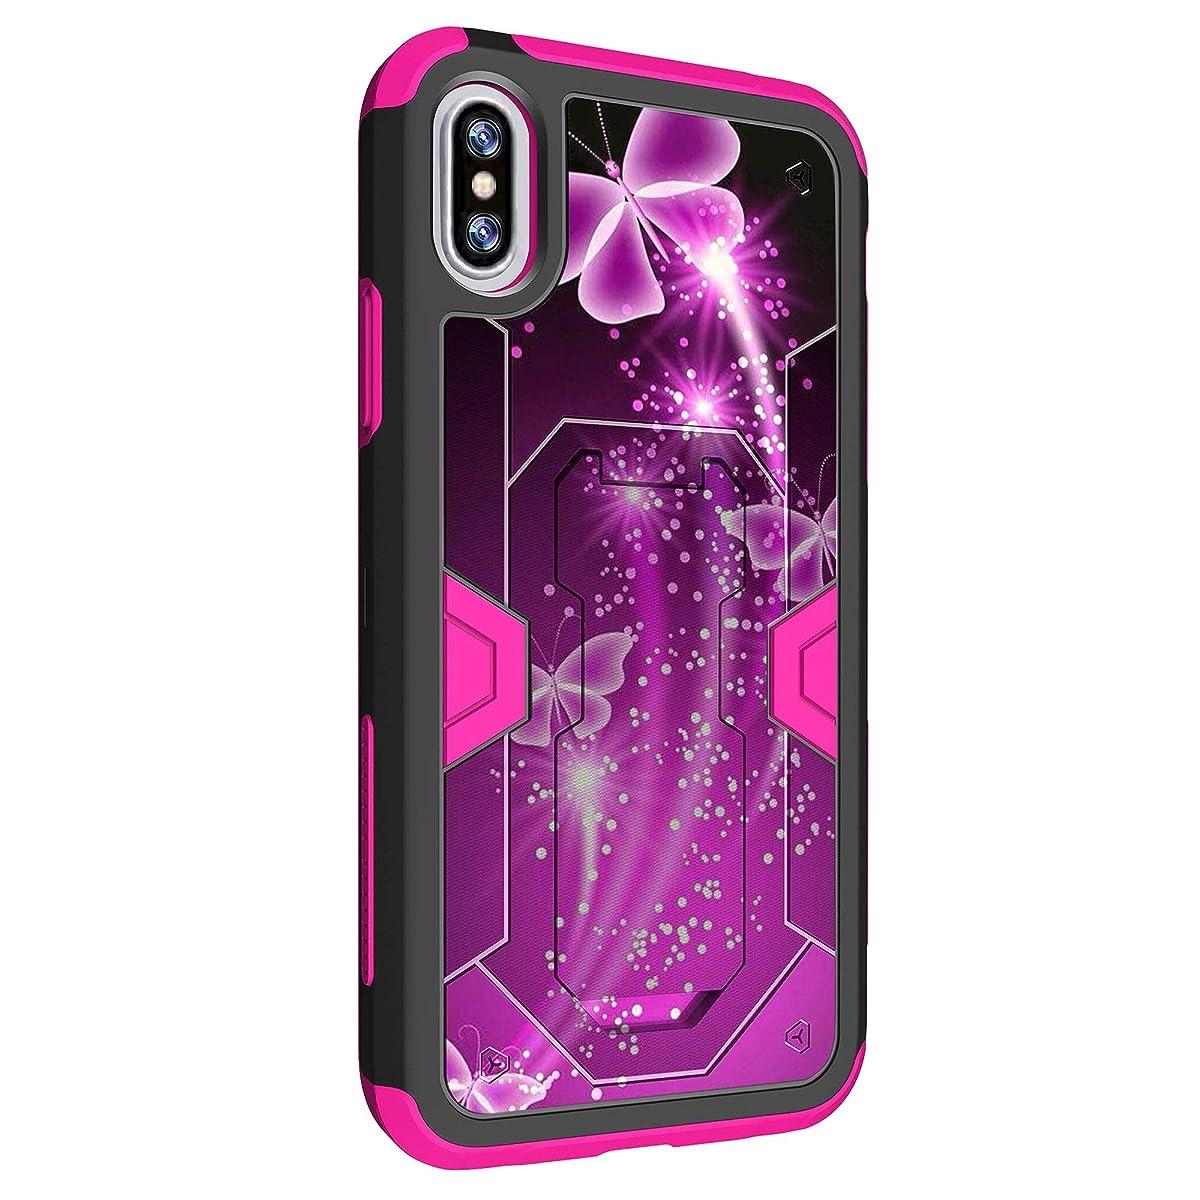 MINITURTLE Case Compatible w/ Premium Pink Hybrid Silicone Apple iPhone X Case w/ Clip [Pink Max Defense Case for Apple iPhone X] iPhone X HighImpact Stand & BeltClip Case Hot Purple Butterfly